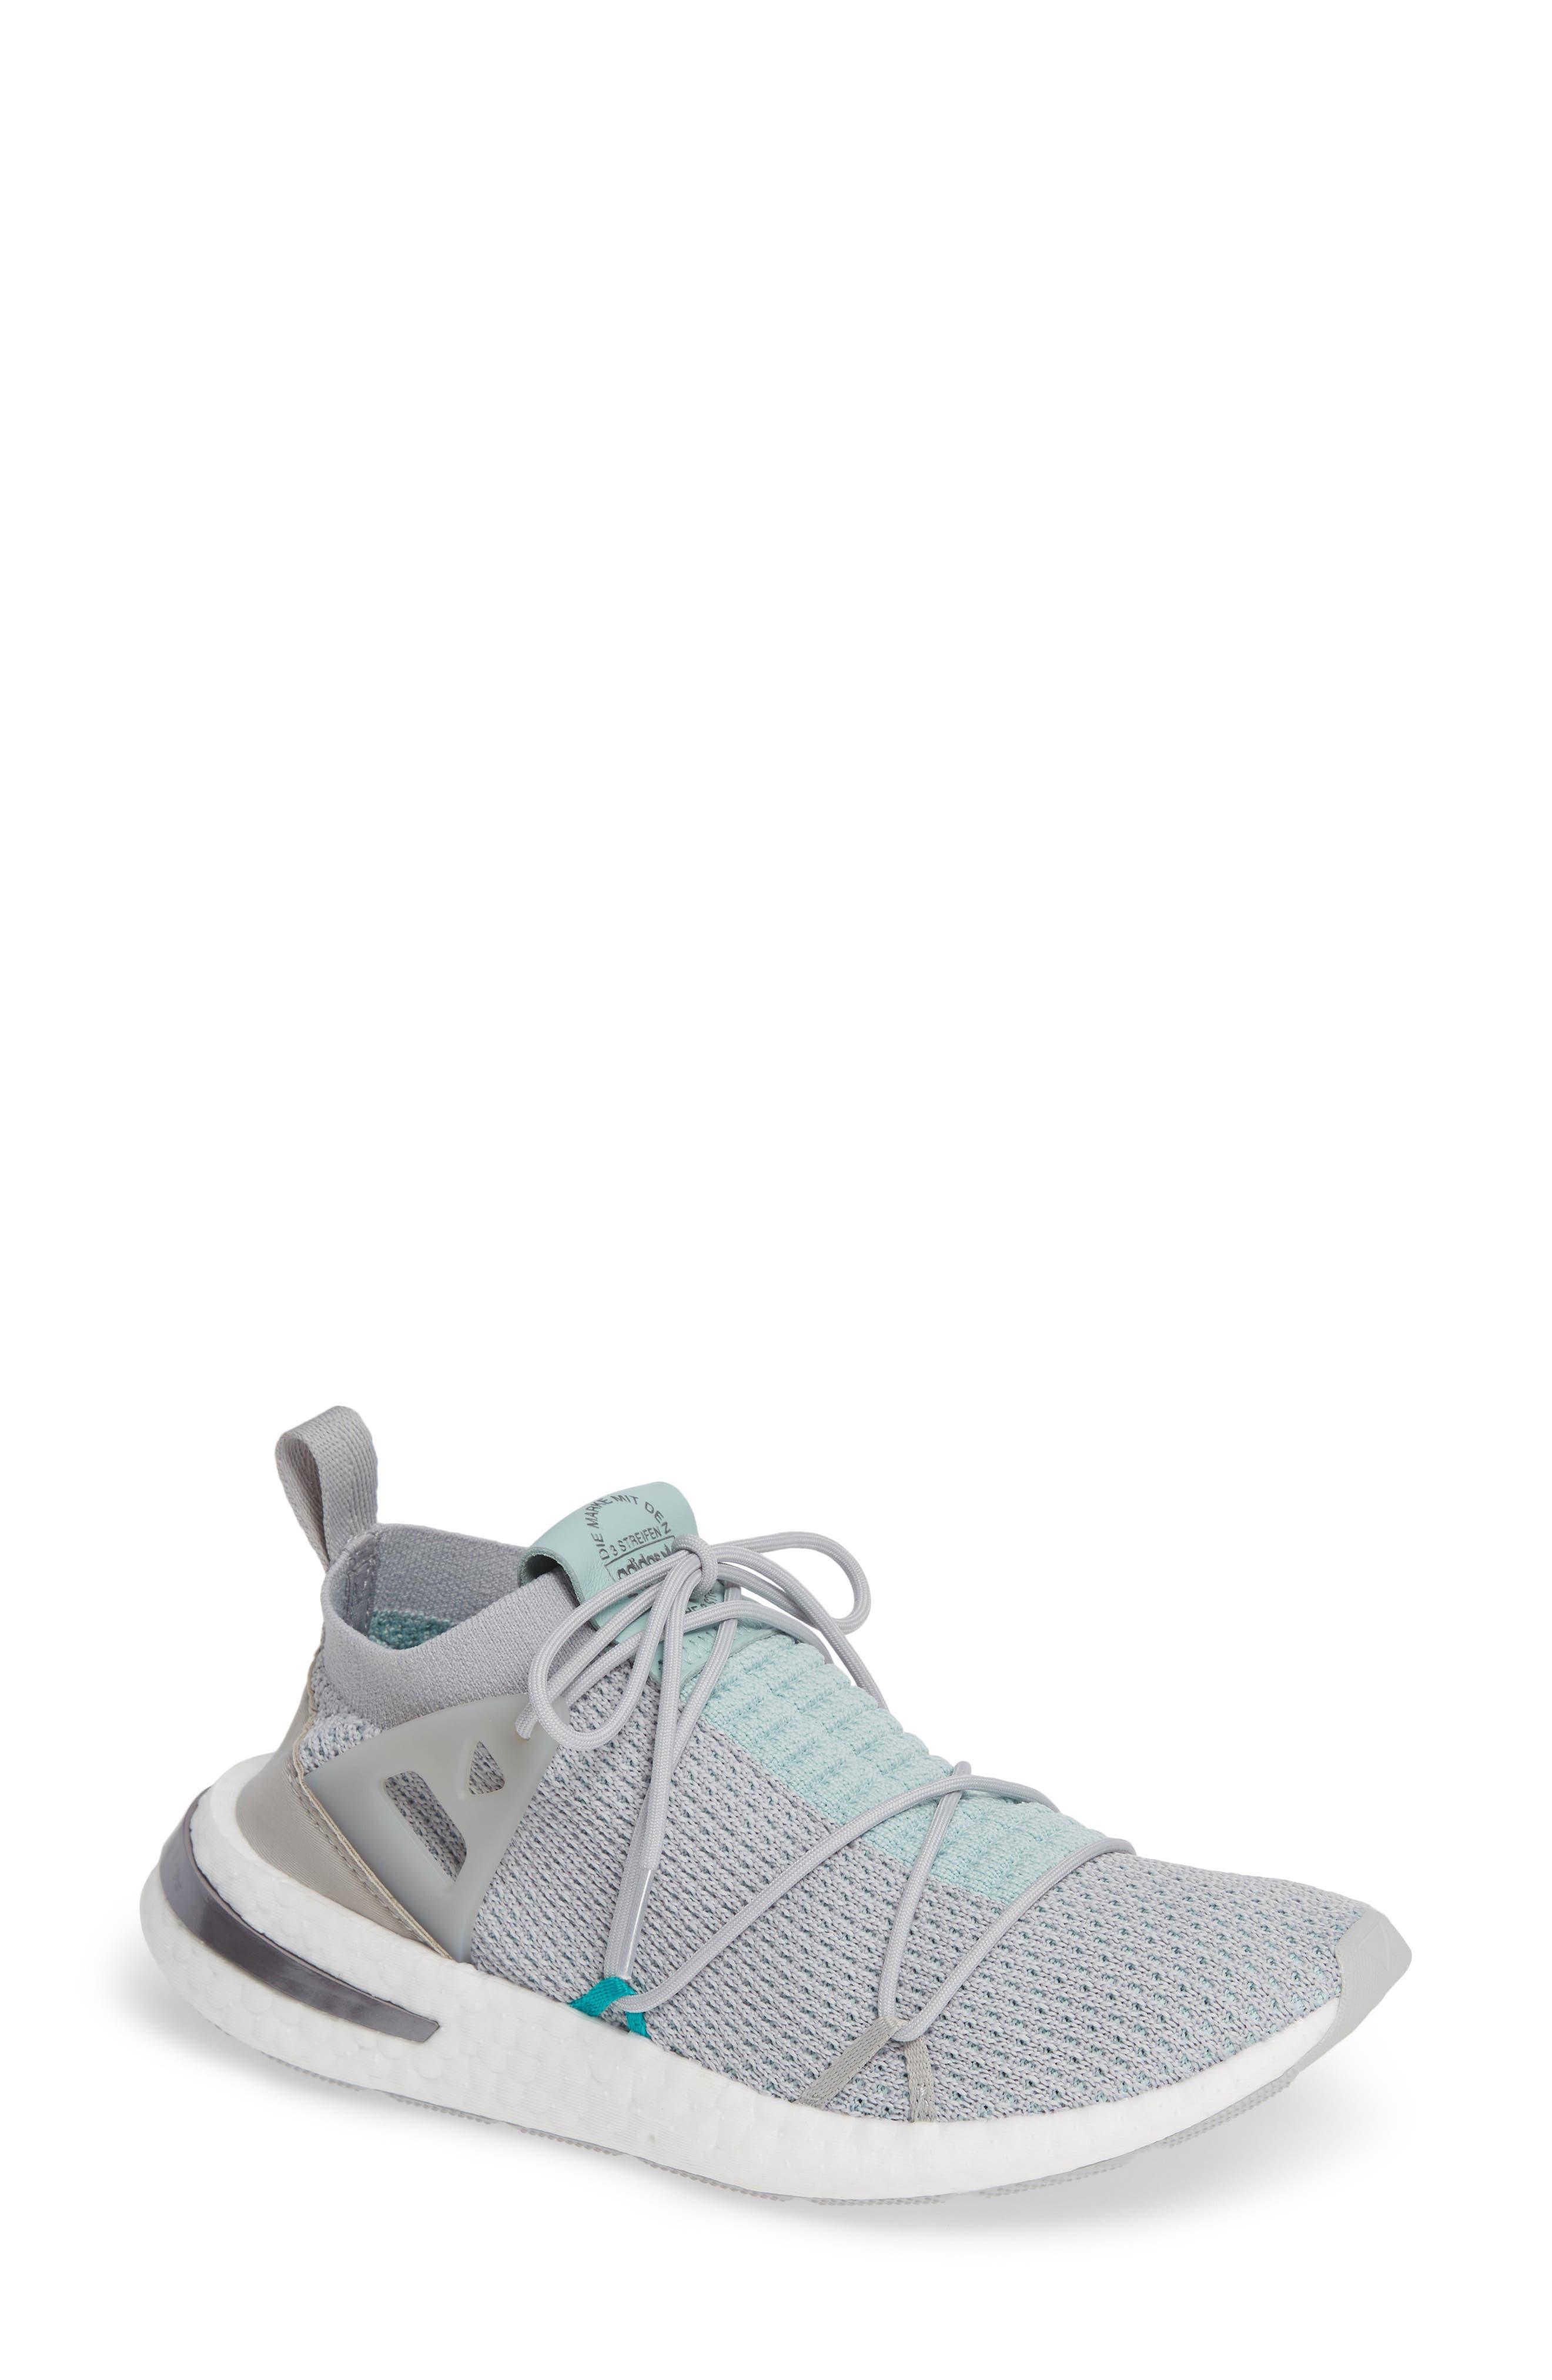 Arkyn Primeknit Sneaker,                             Main thumbnail 1, color,                             GREY TWO/ GREY TWO/ ASH GREEN